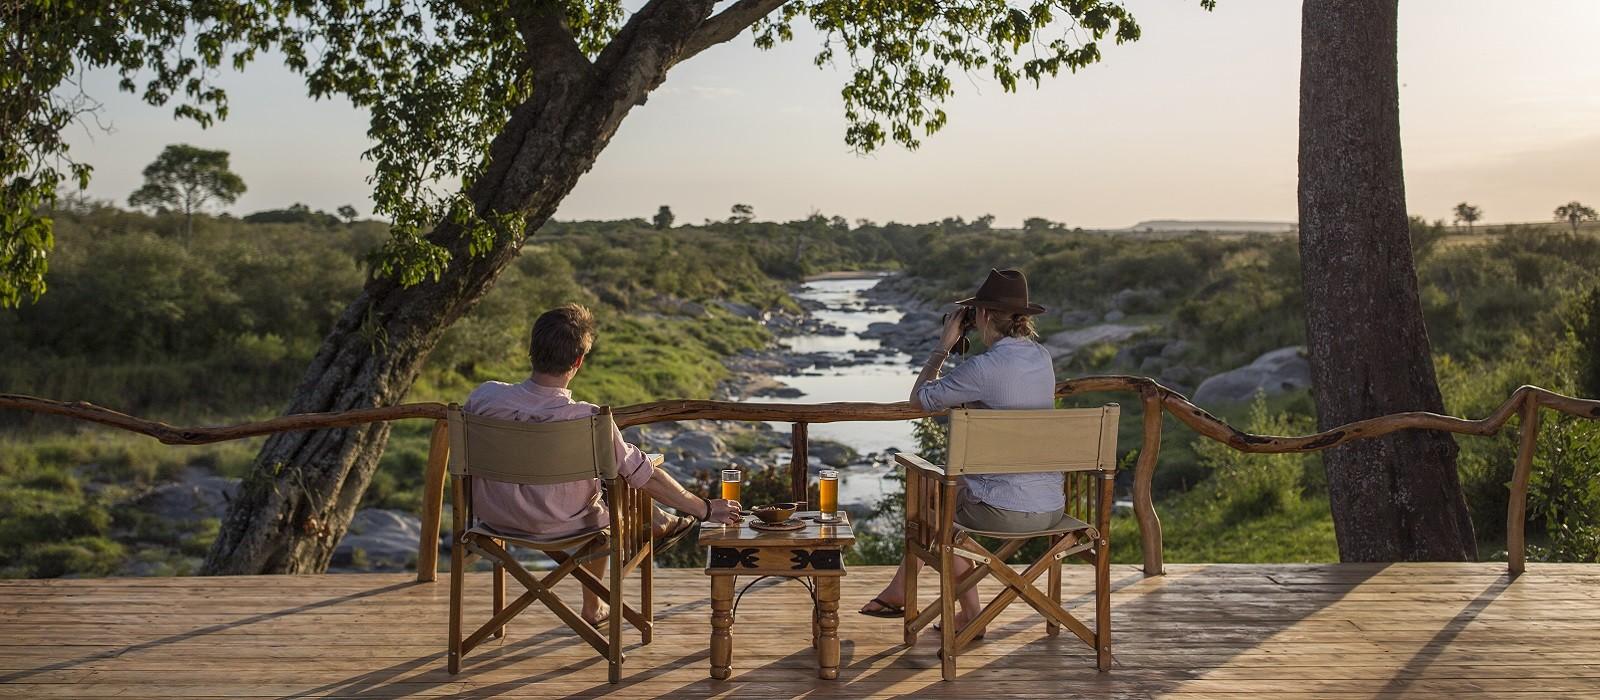 Hotel Rekero Tented Camp Kenia